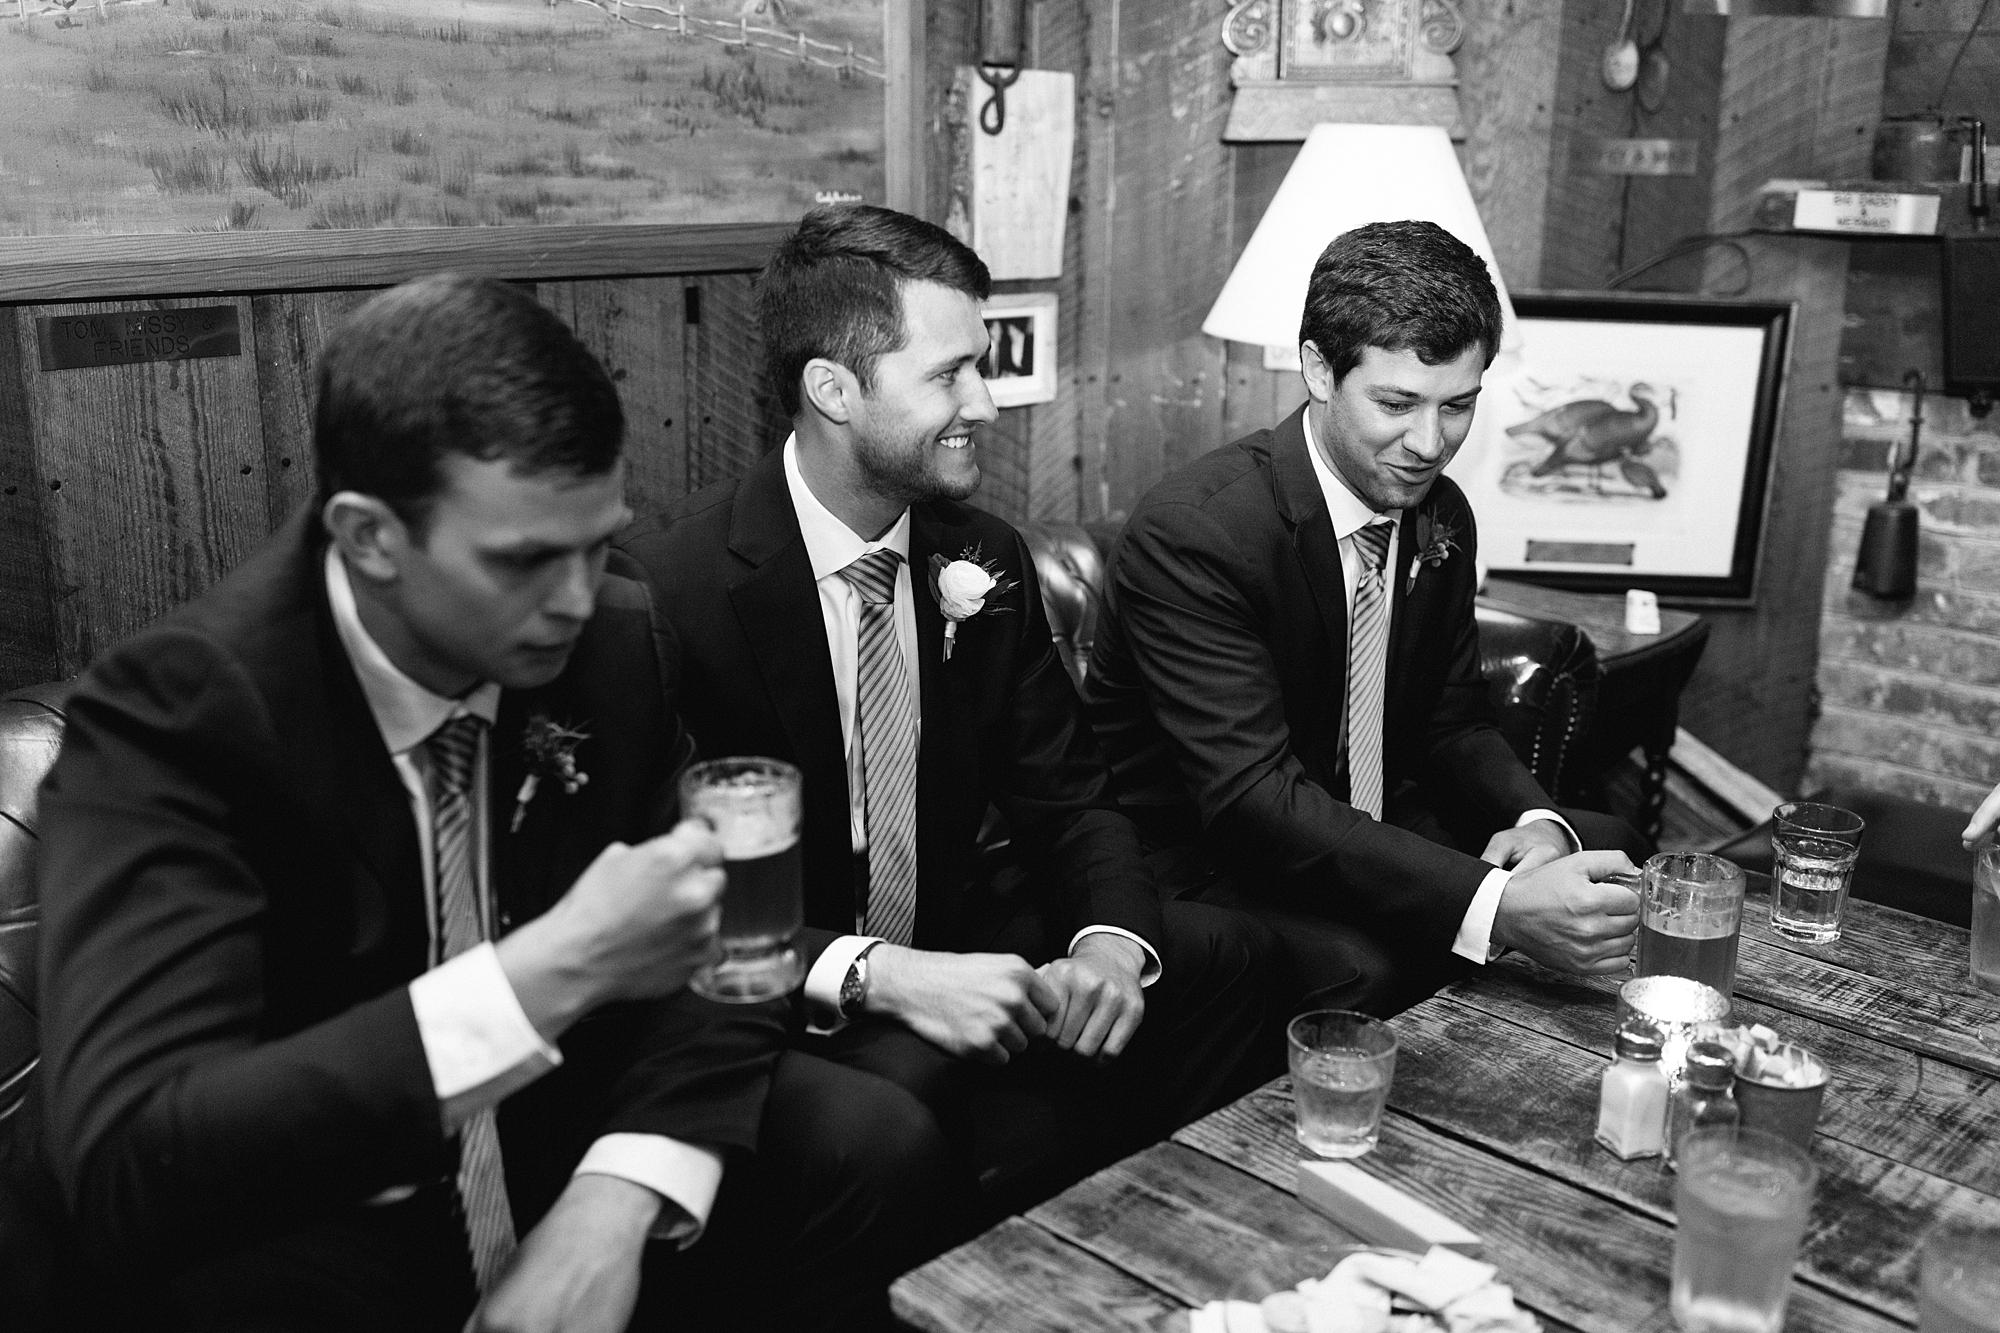 Angus-Barn-Pavilion-Raleigh-Wedding-Film-Photographer_0142.jpg